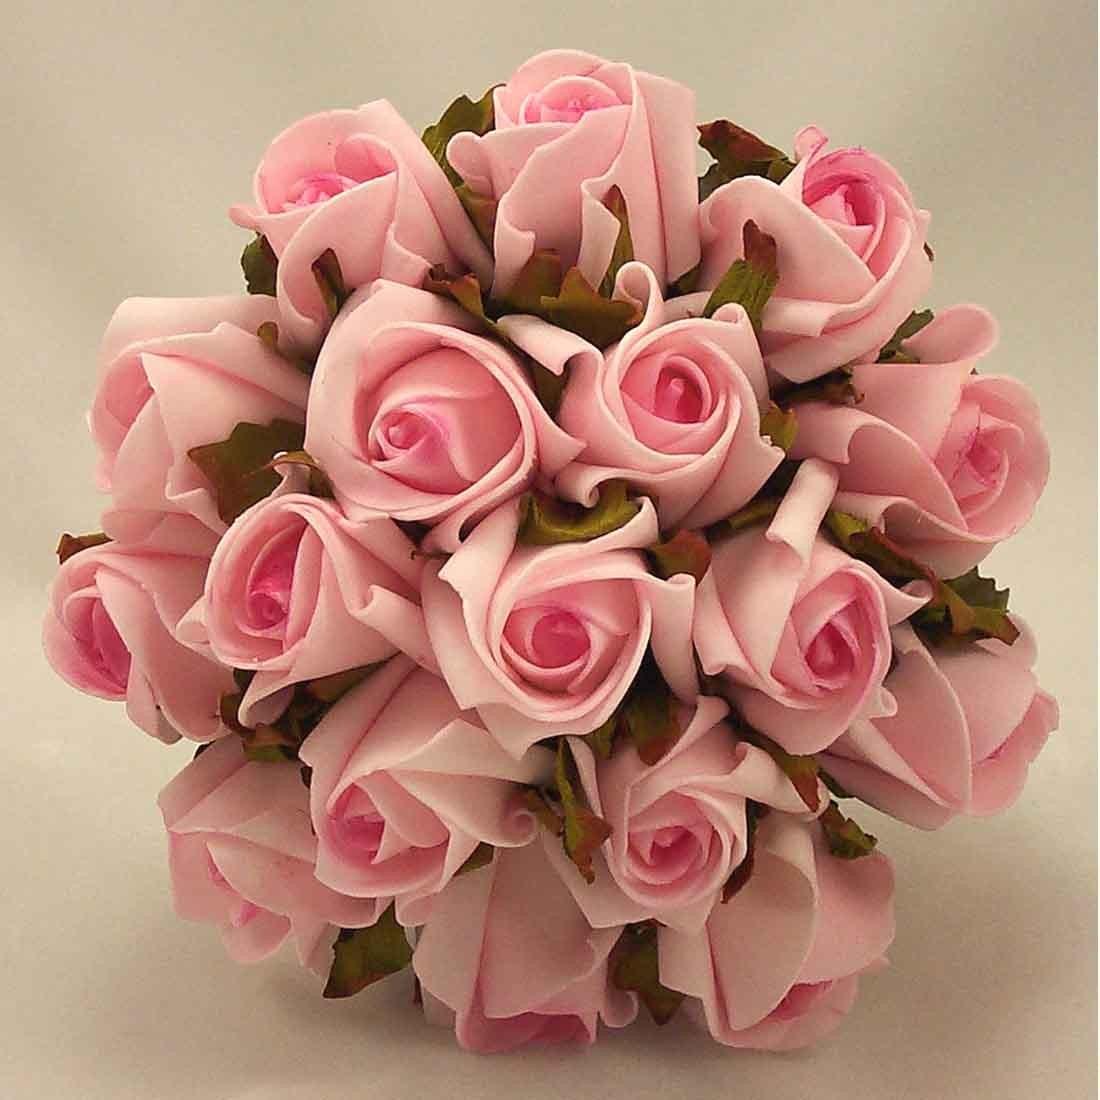 Raspberry Pink Jubilee Rose Bridesmaid's Posy